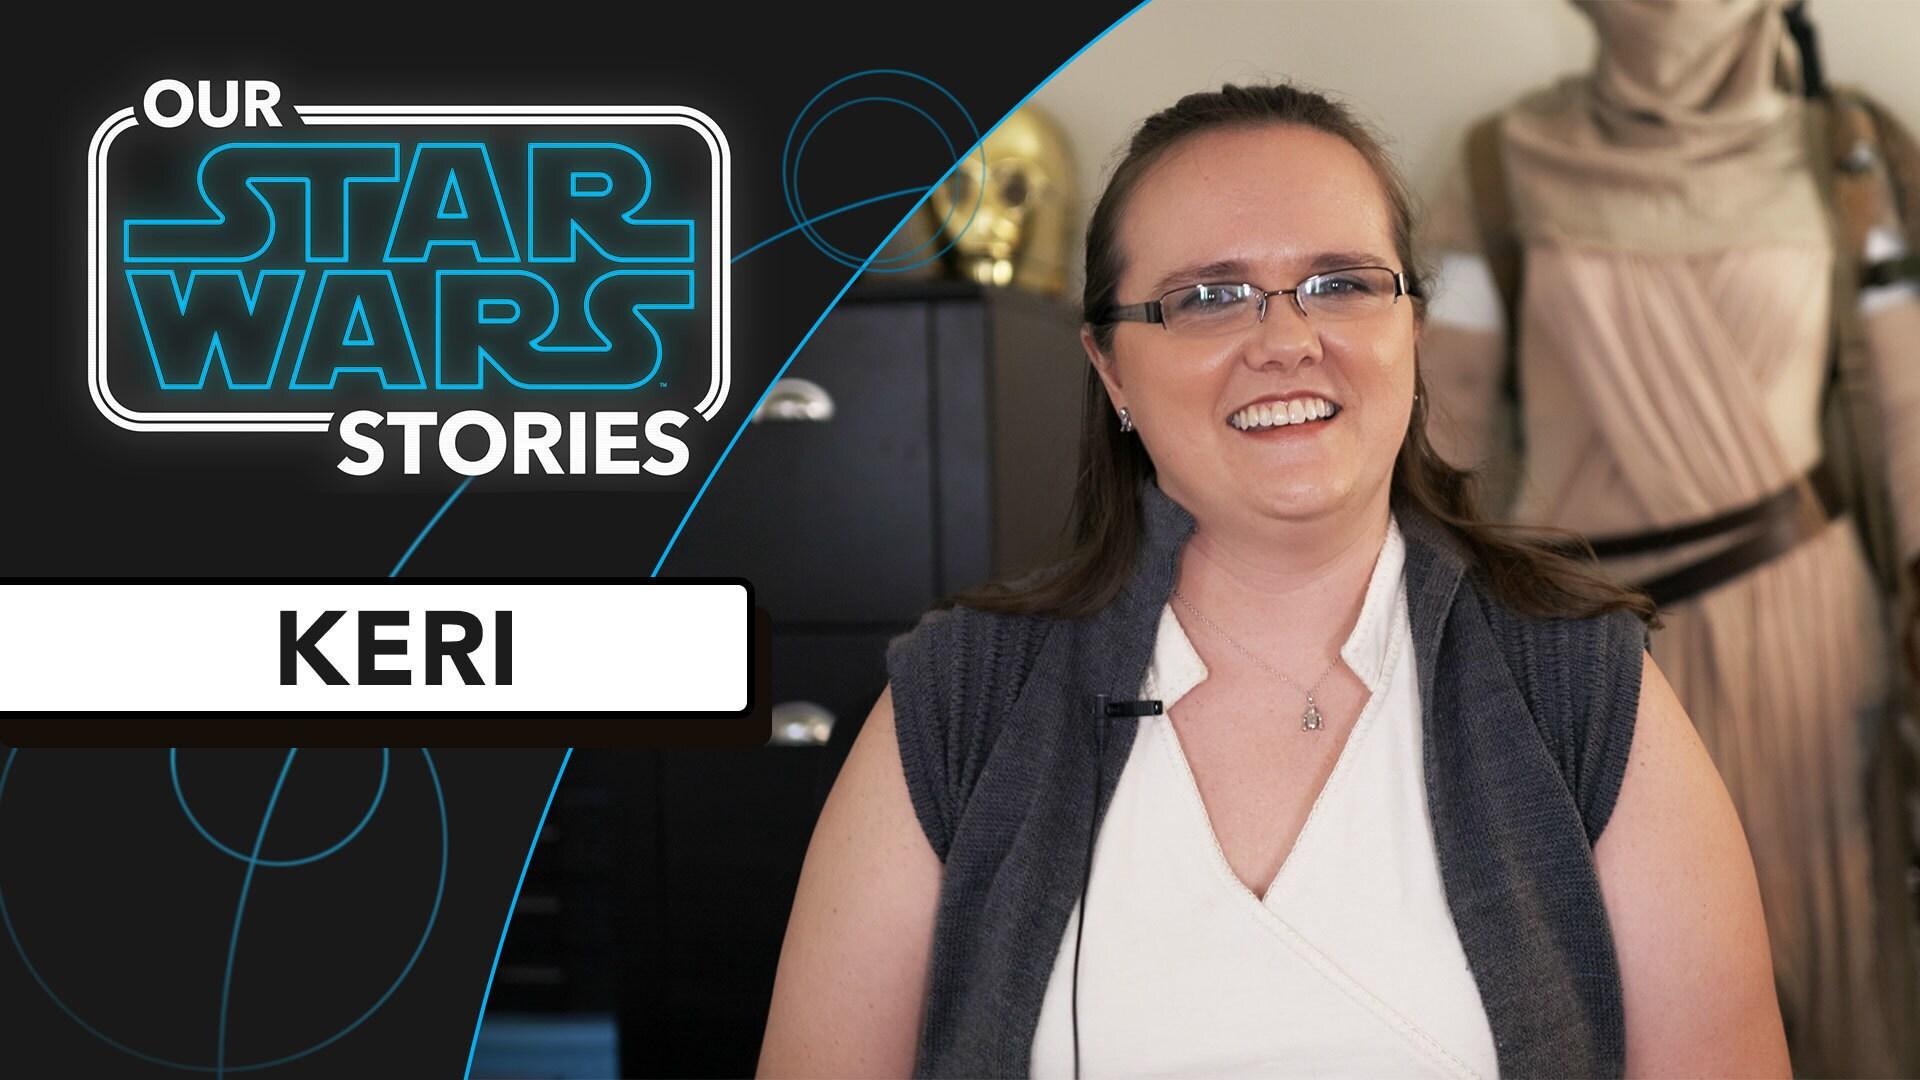 Keri Bean: From A Galaxy Far, Far Away to Mars | Our Star Wars Stories